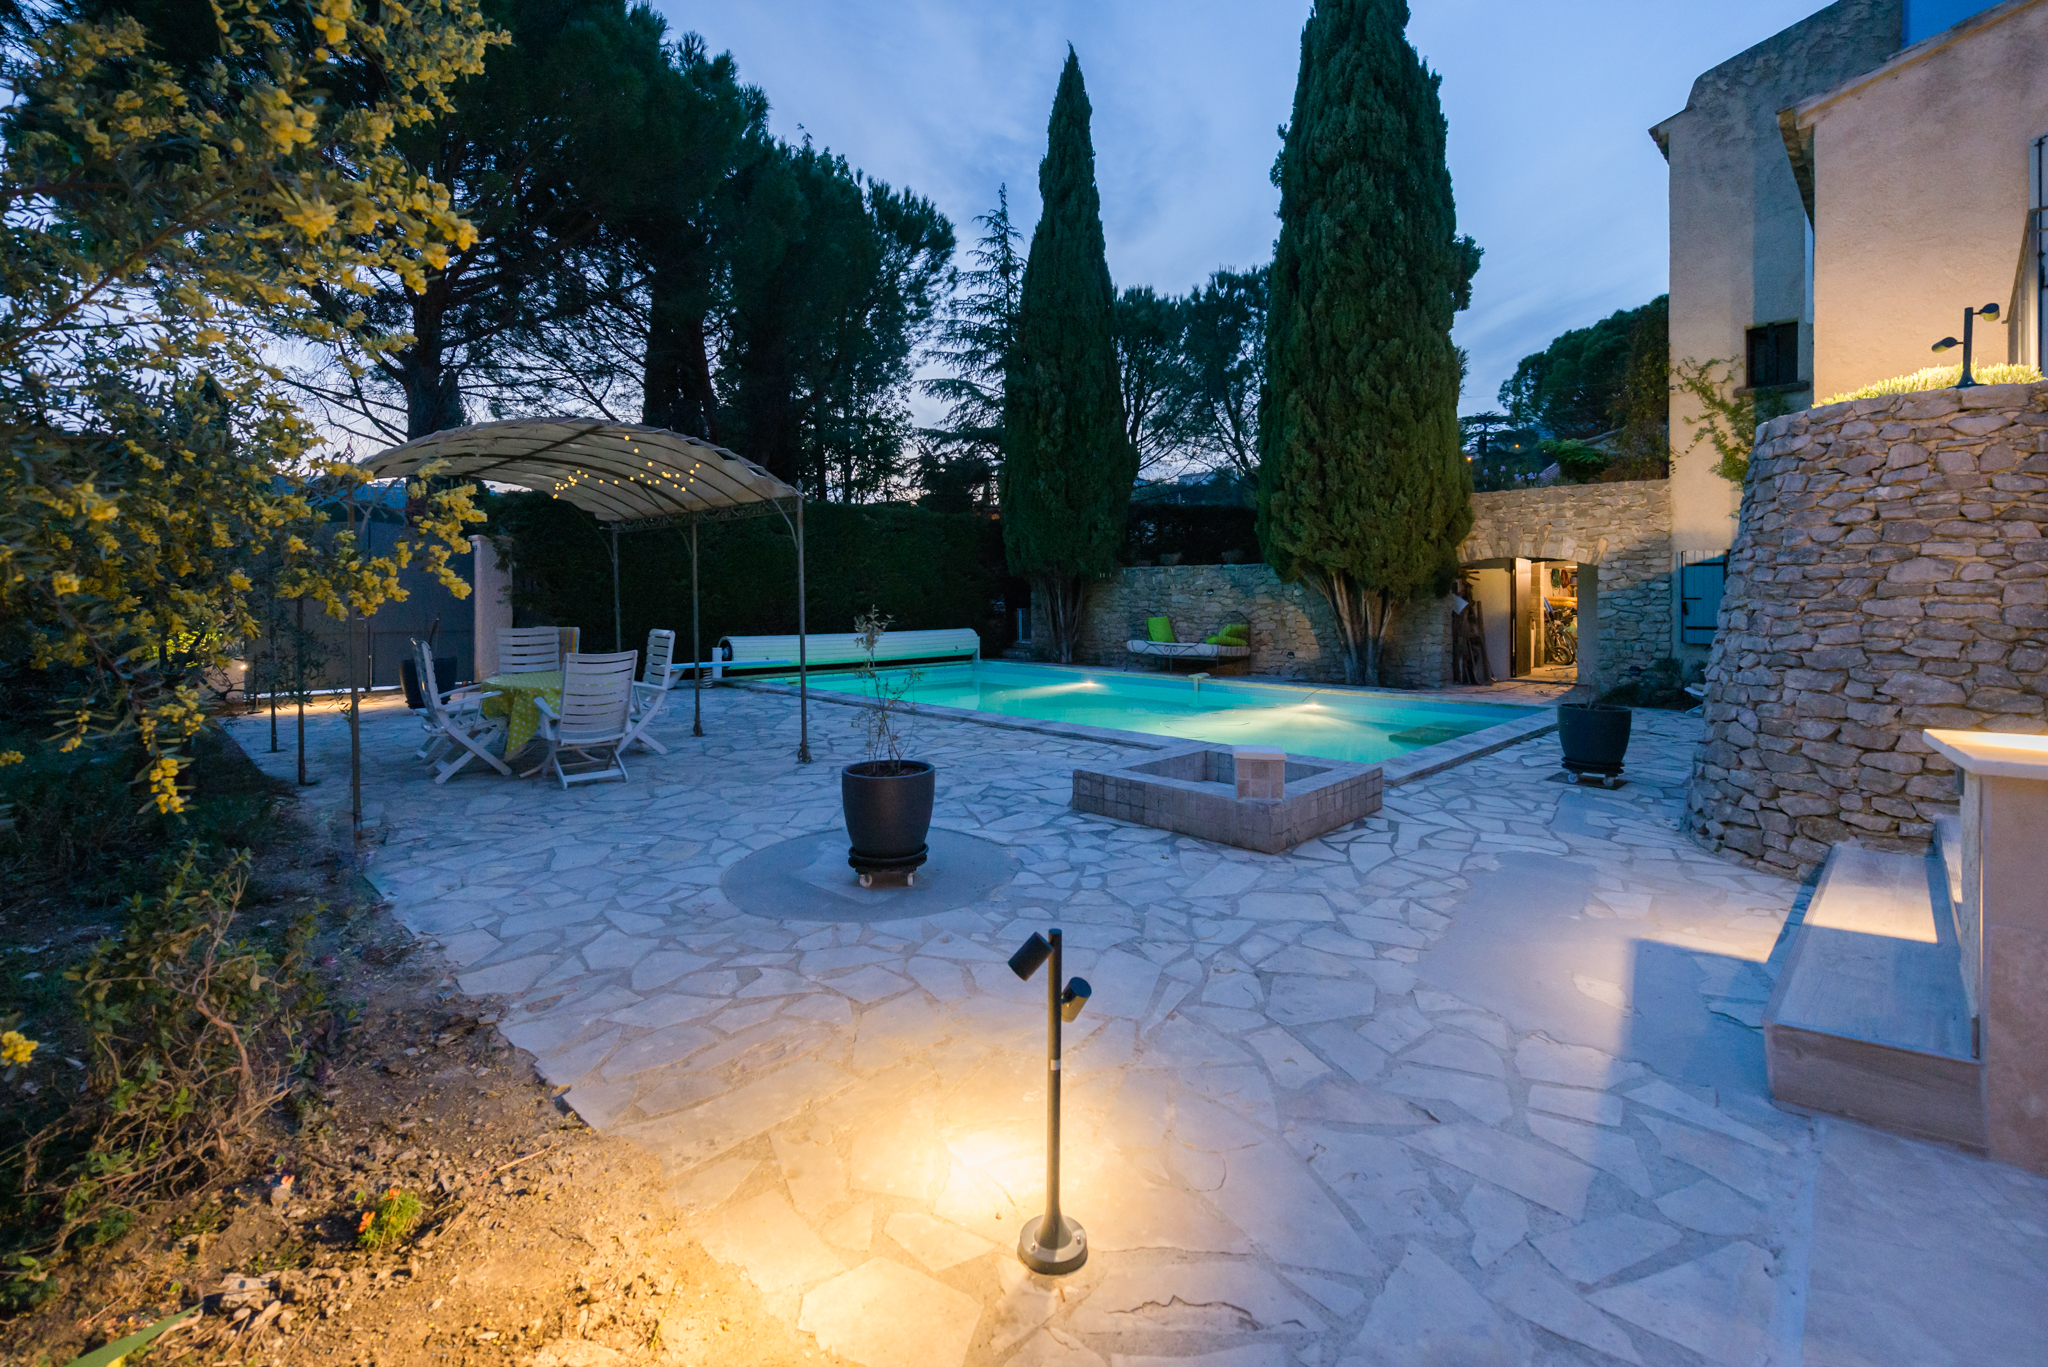 feriebolig-provence-privat-pool-DSC_4814.jpg